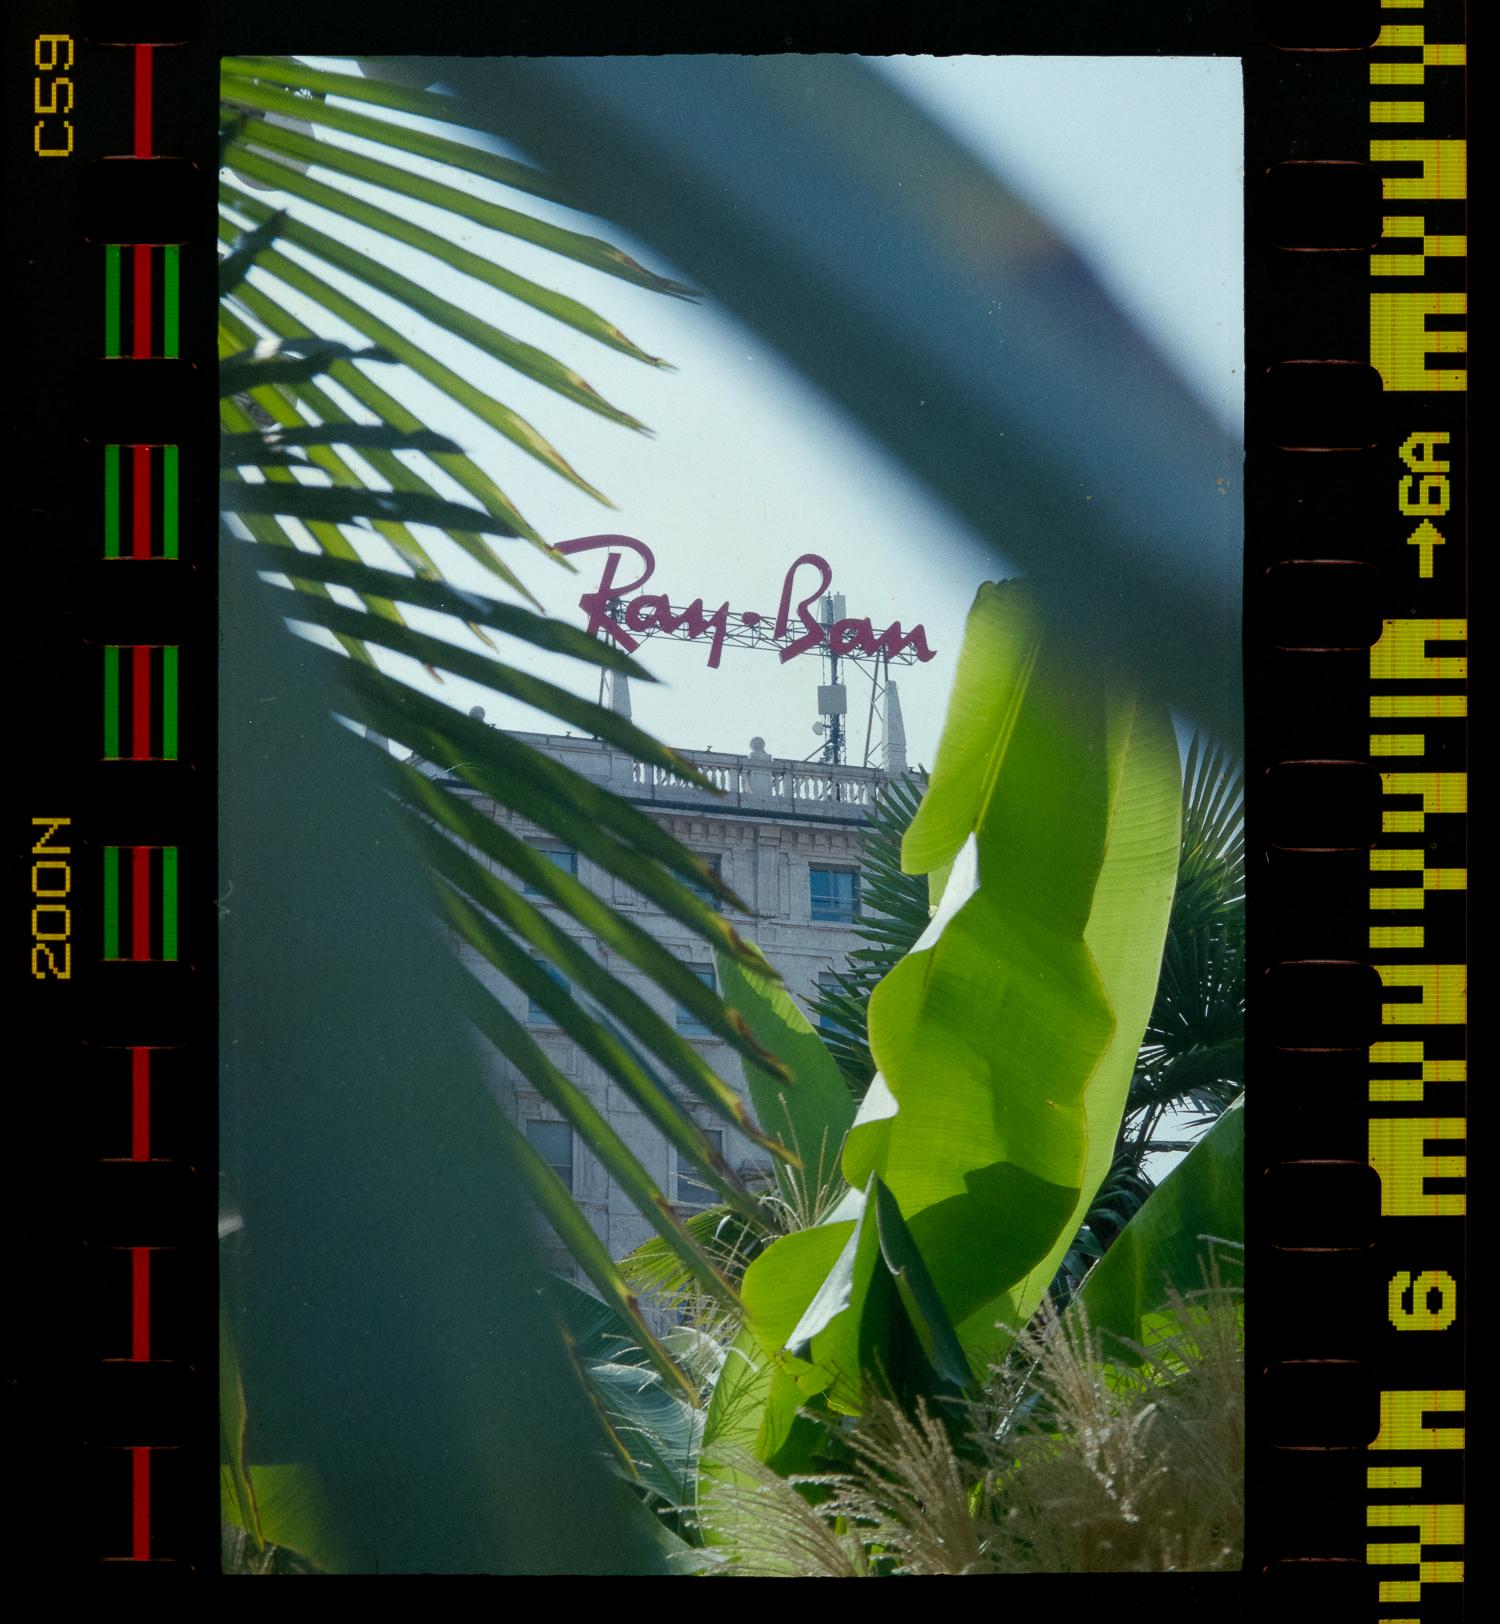 Olympus AZ-1 Zoom 35mm Vintage Film Camera Review Jay McLaughlin Agfa Vista Expired Milan